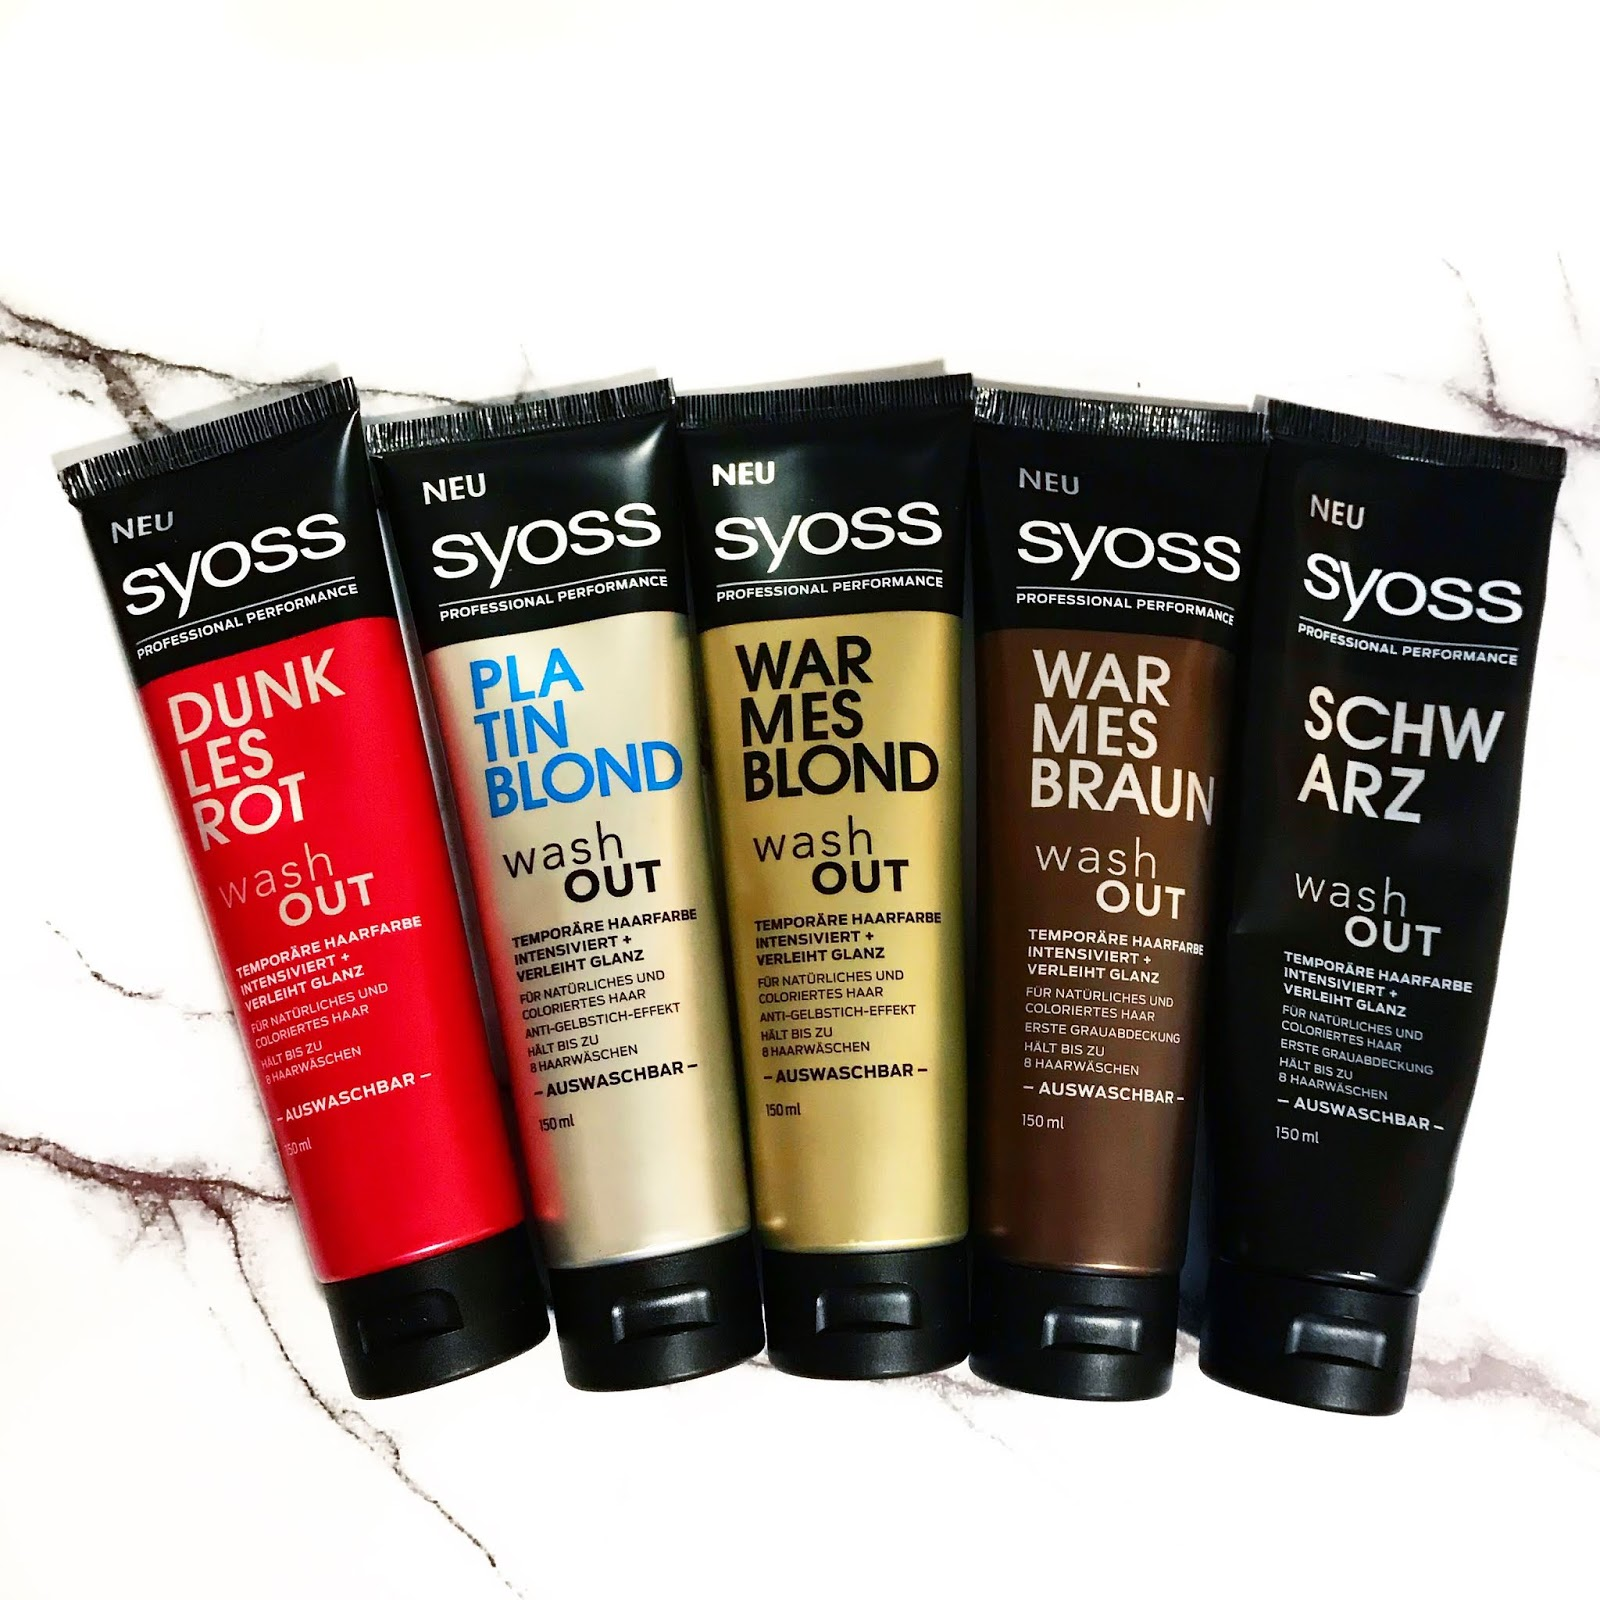 Friseur Shampoo Test